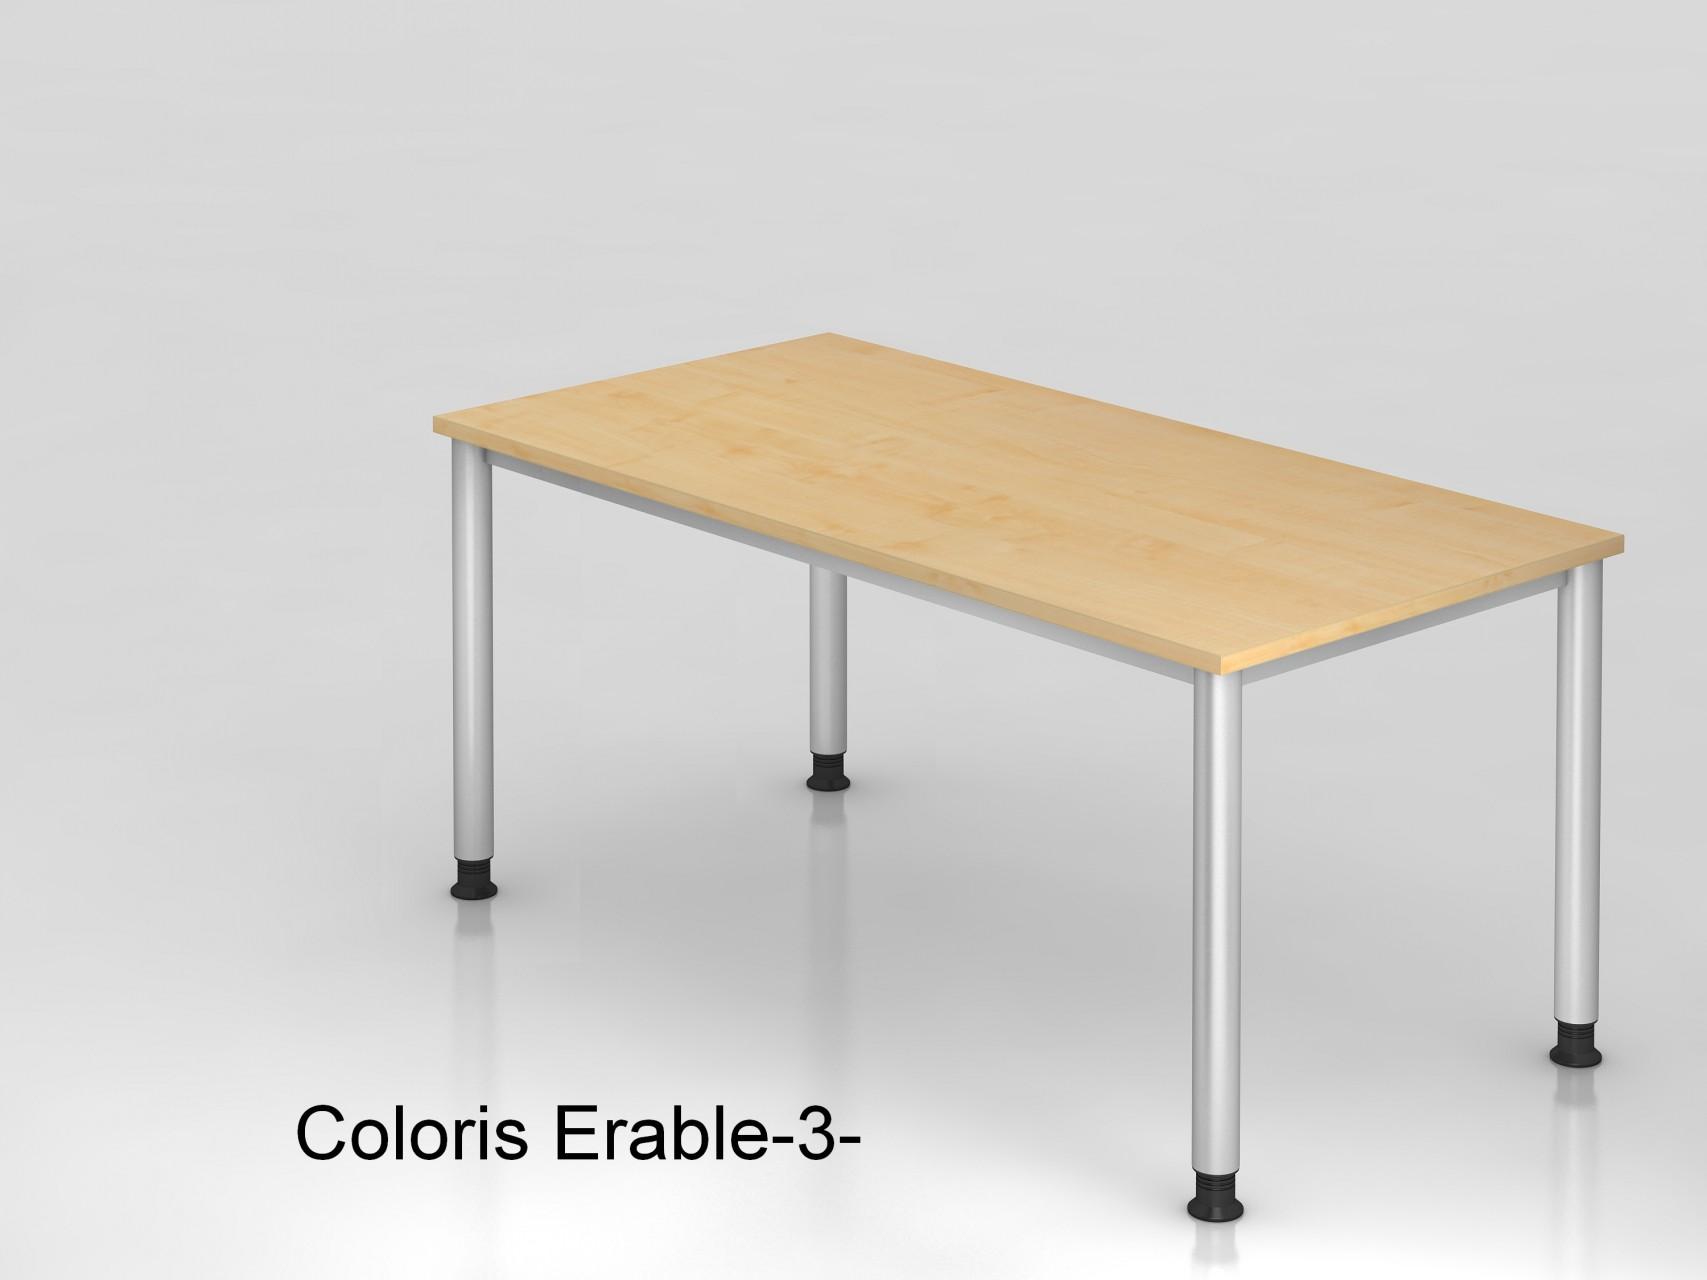 bureau r glable en hauteur variance. Black Bedroom Furniture Sets. Home Design Ideas